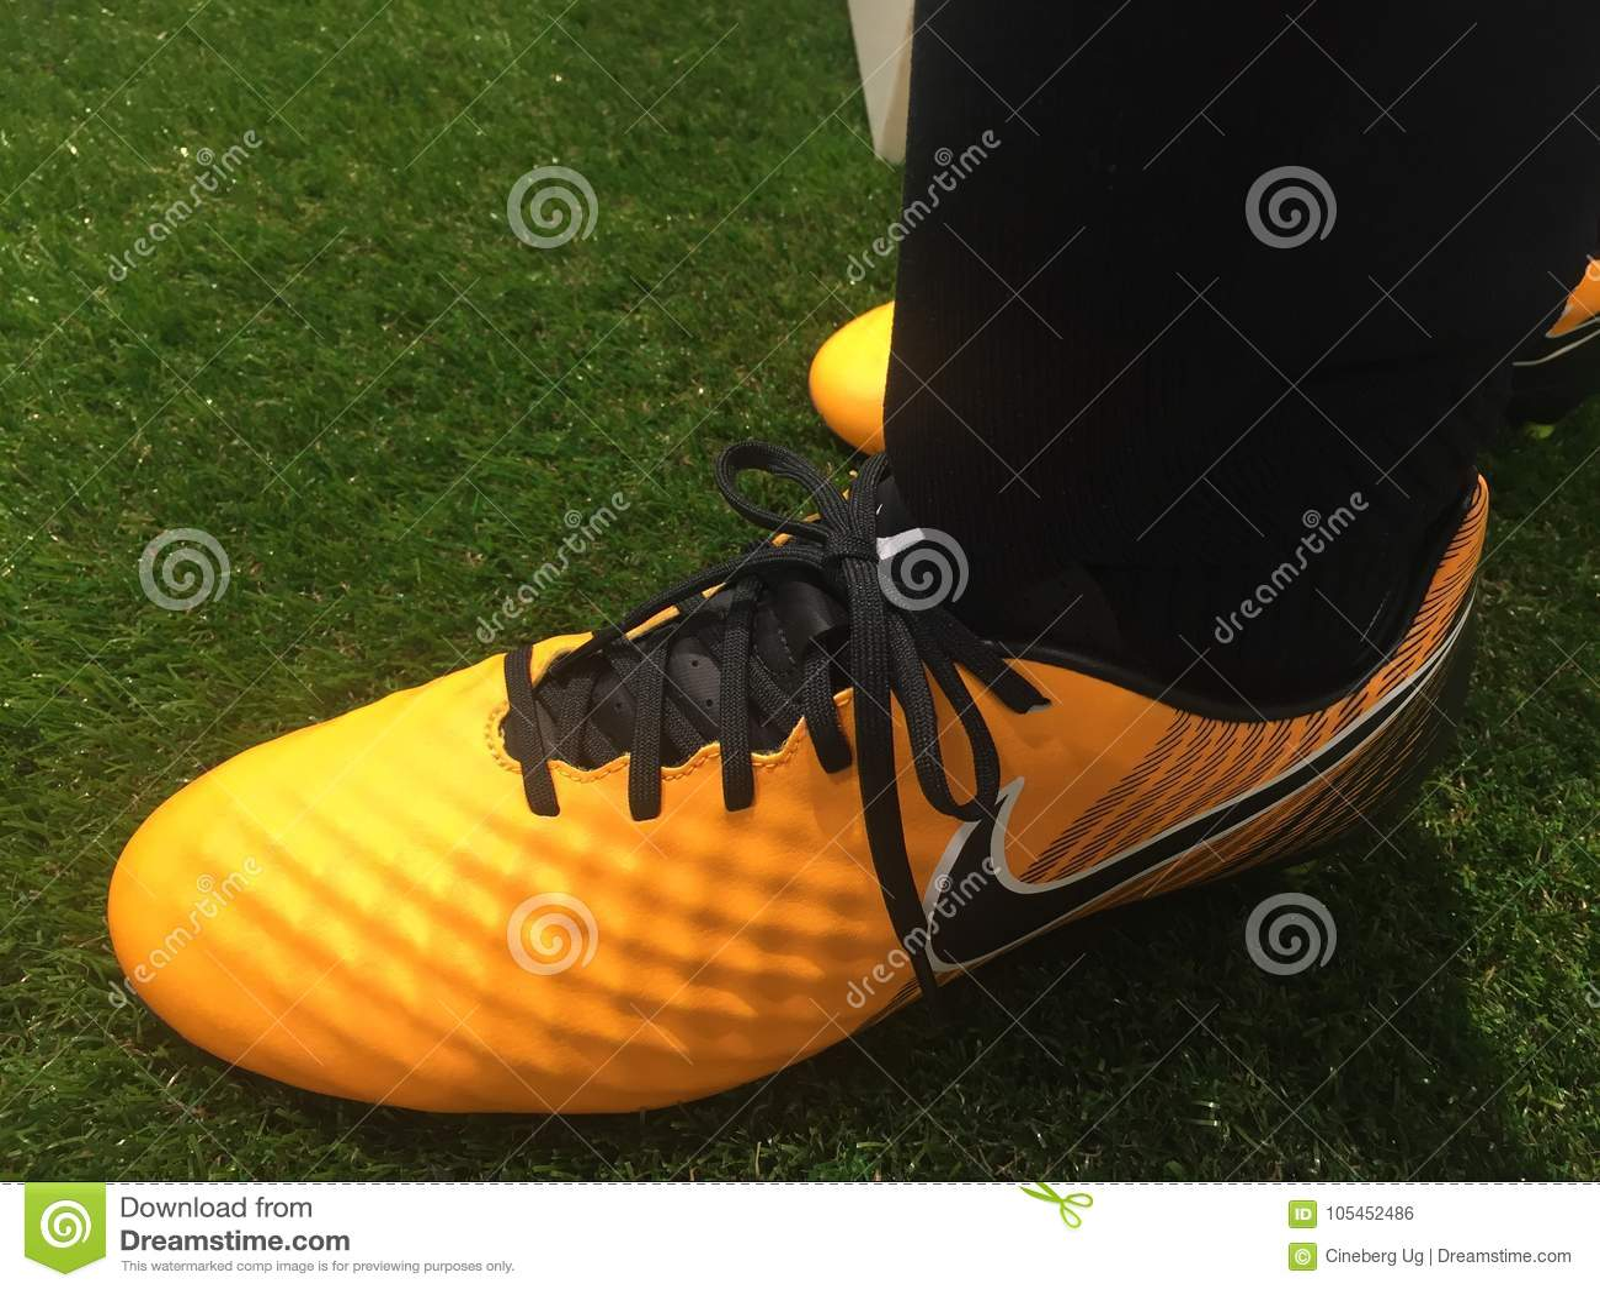 19df1b3154e Βερολίνο, Γερμανία - 28 Νοεμβρίου 2017: Παπούτσια ποδοσφαίρου της Nike για  την πώληση Η Nike είναι σφαιρικά αθλητικά ενδύματα και ο τρέχοντας  λιανοπωλητής ...